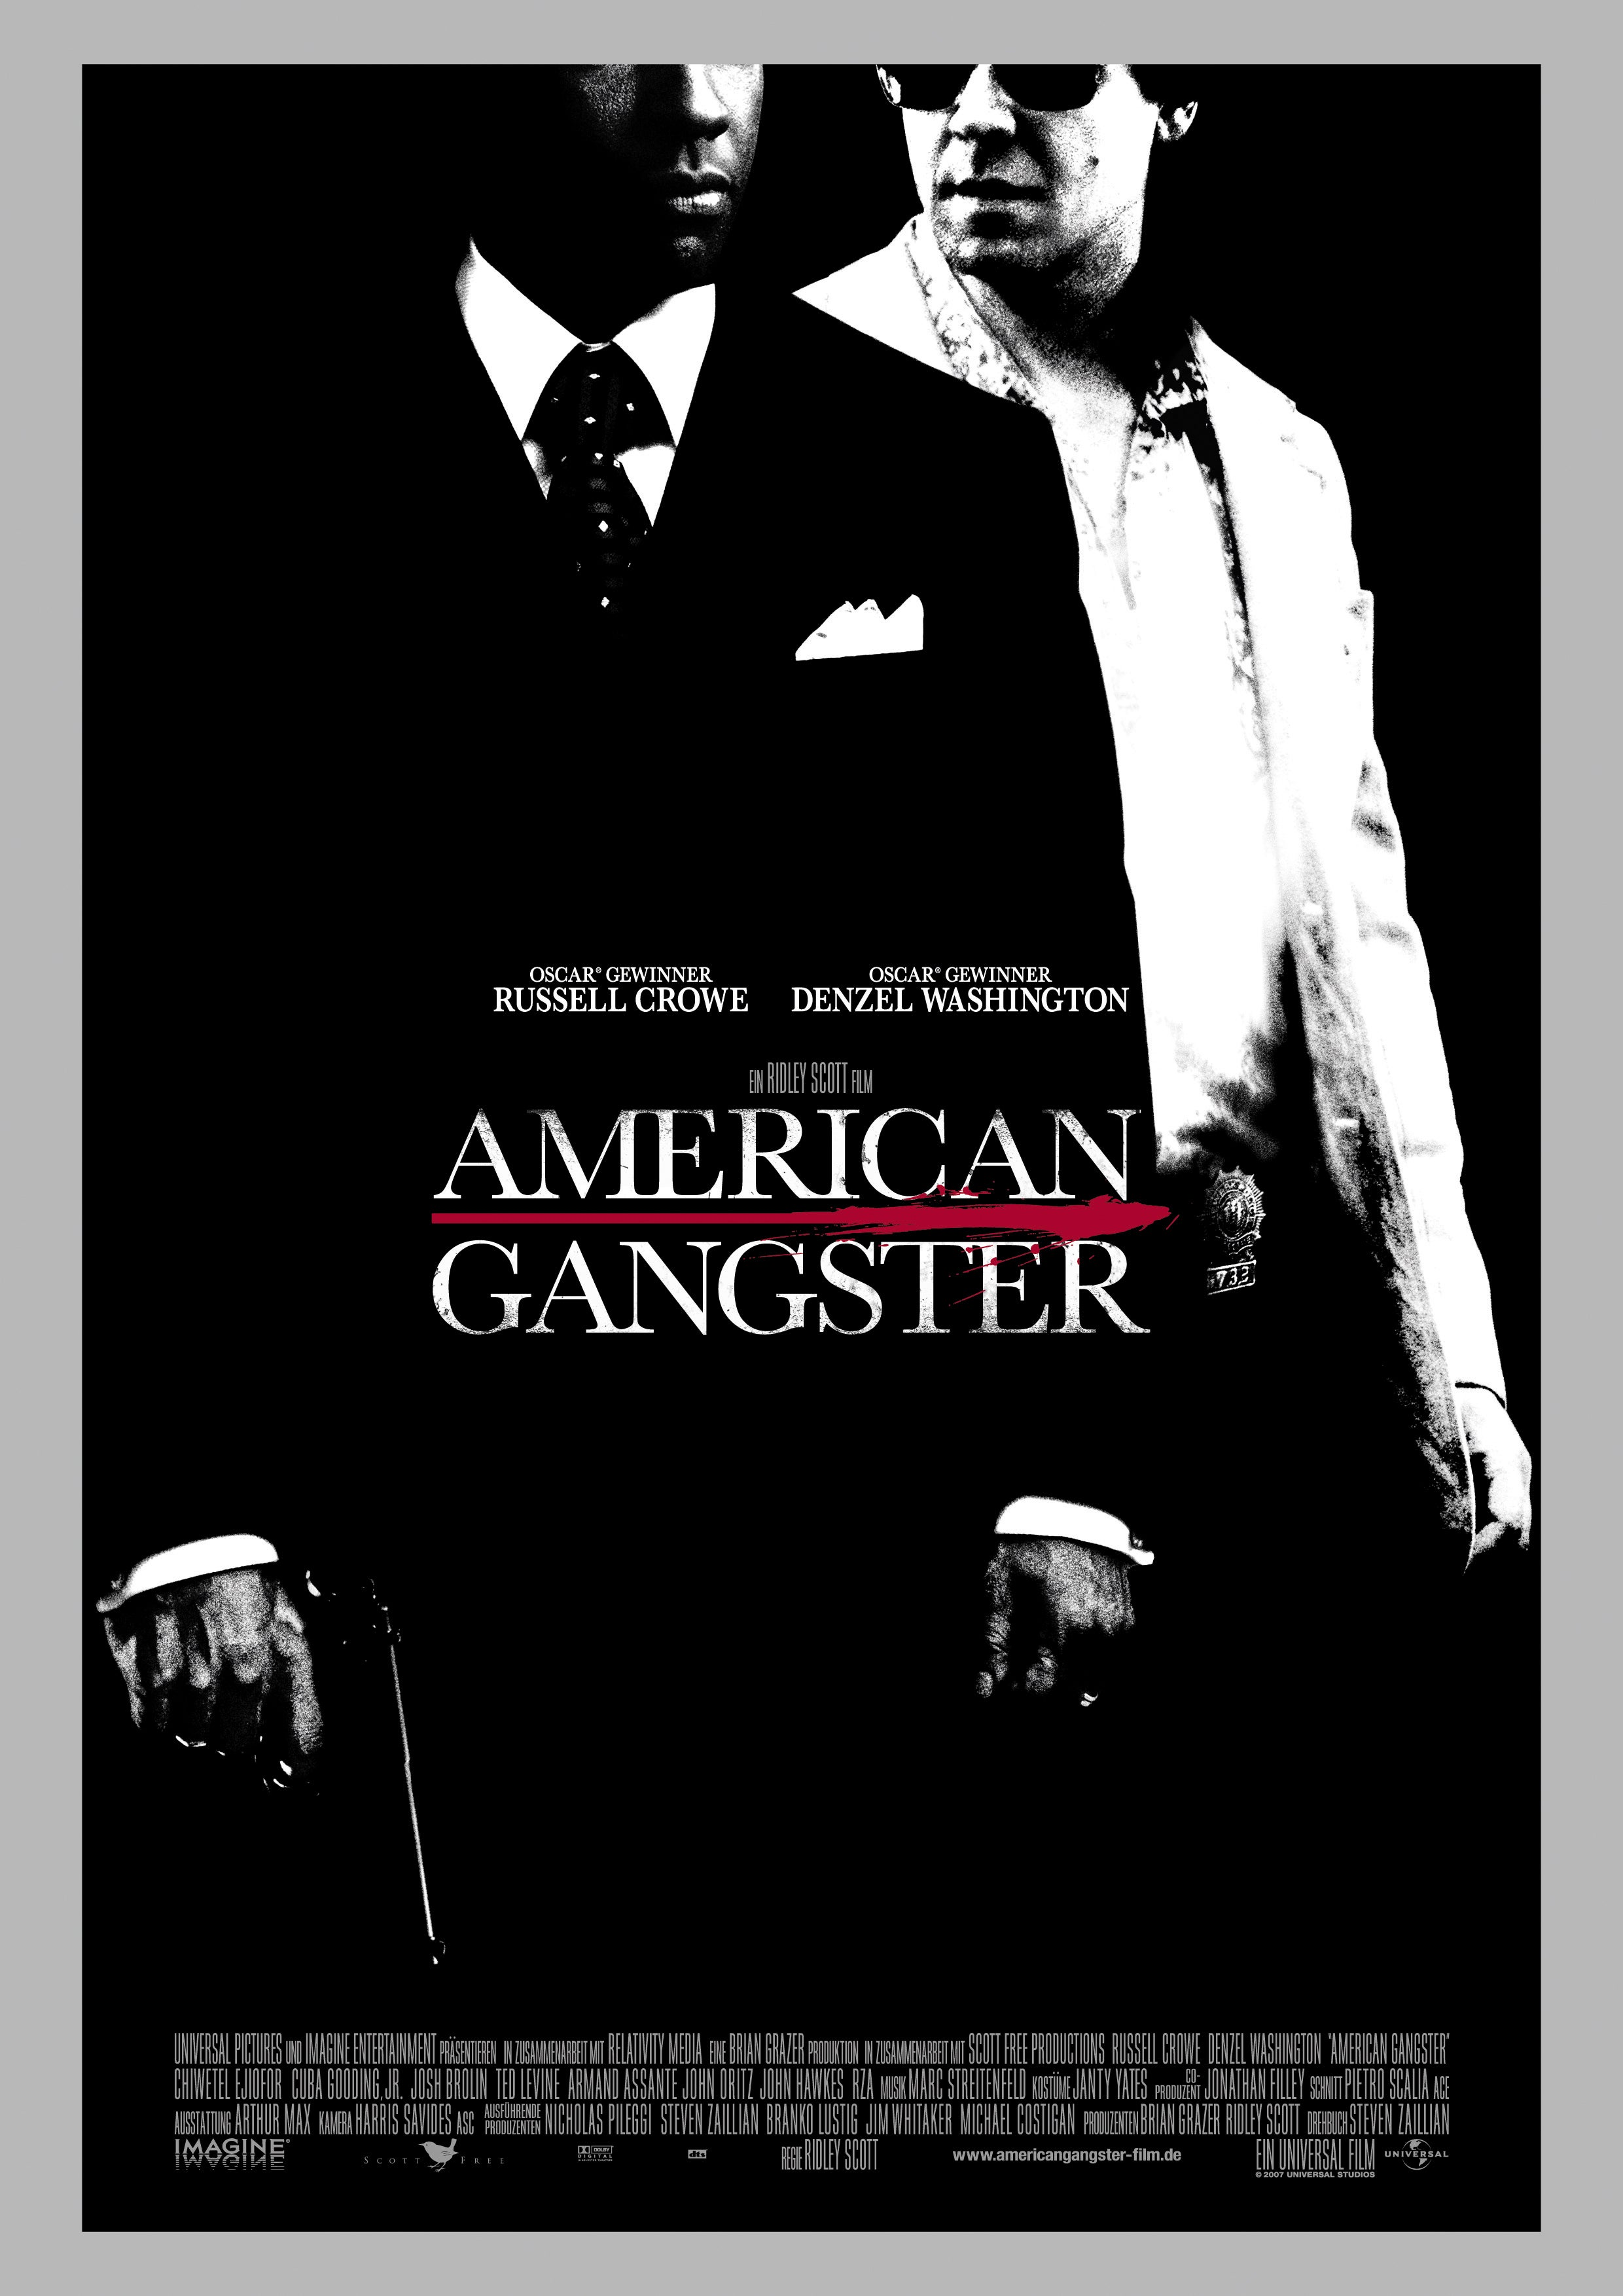 American Ganagster